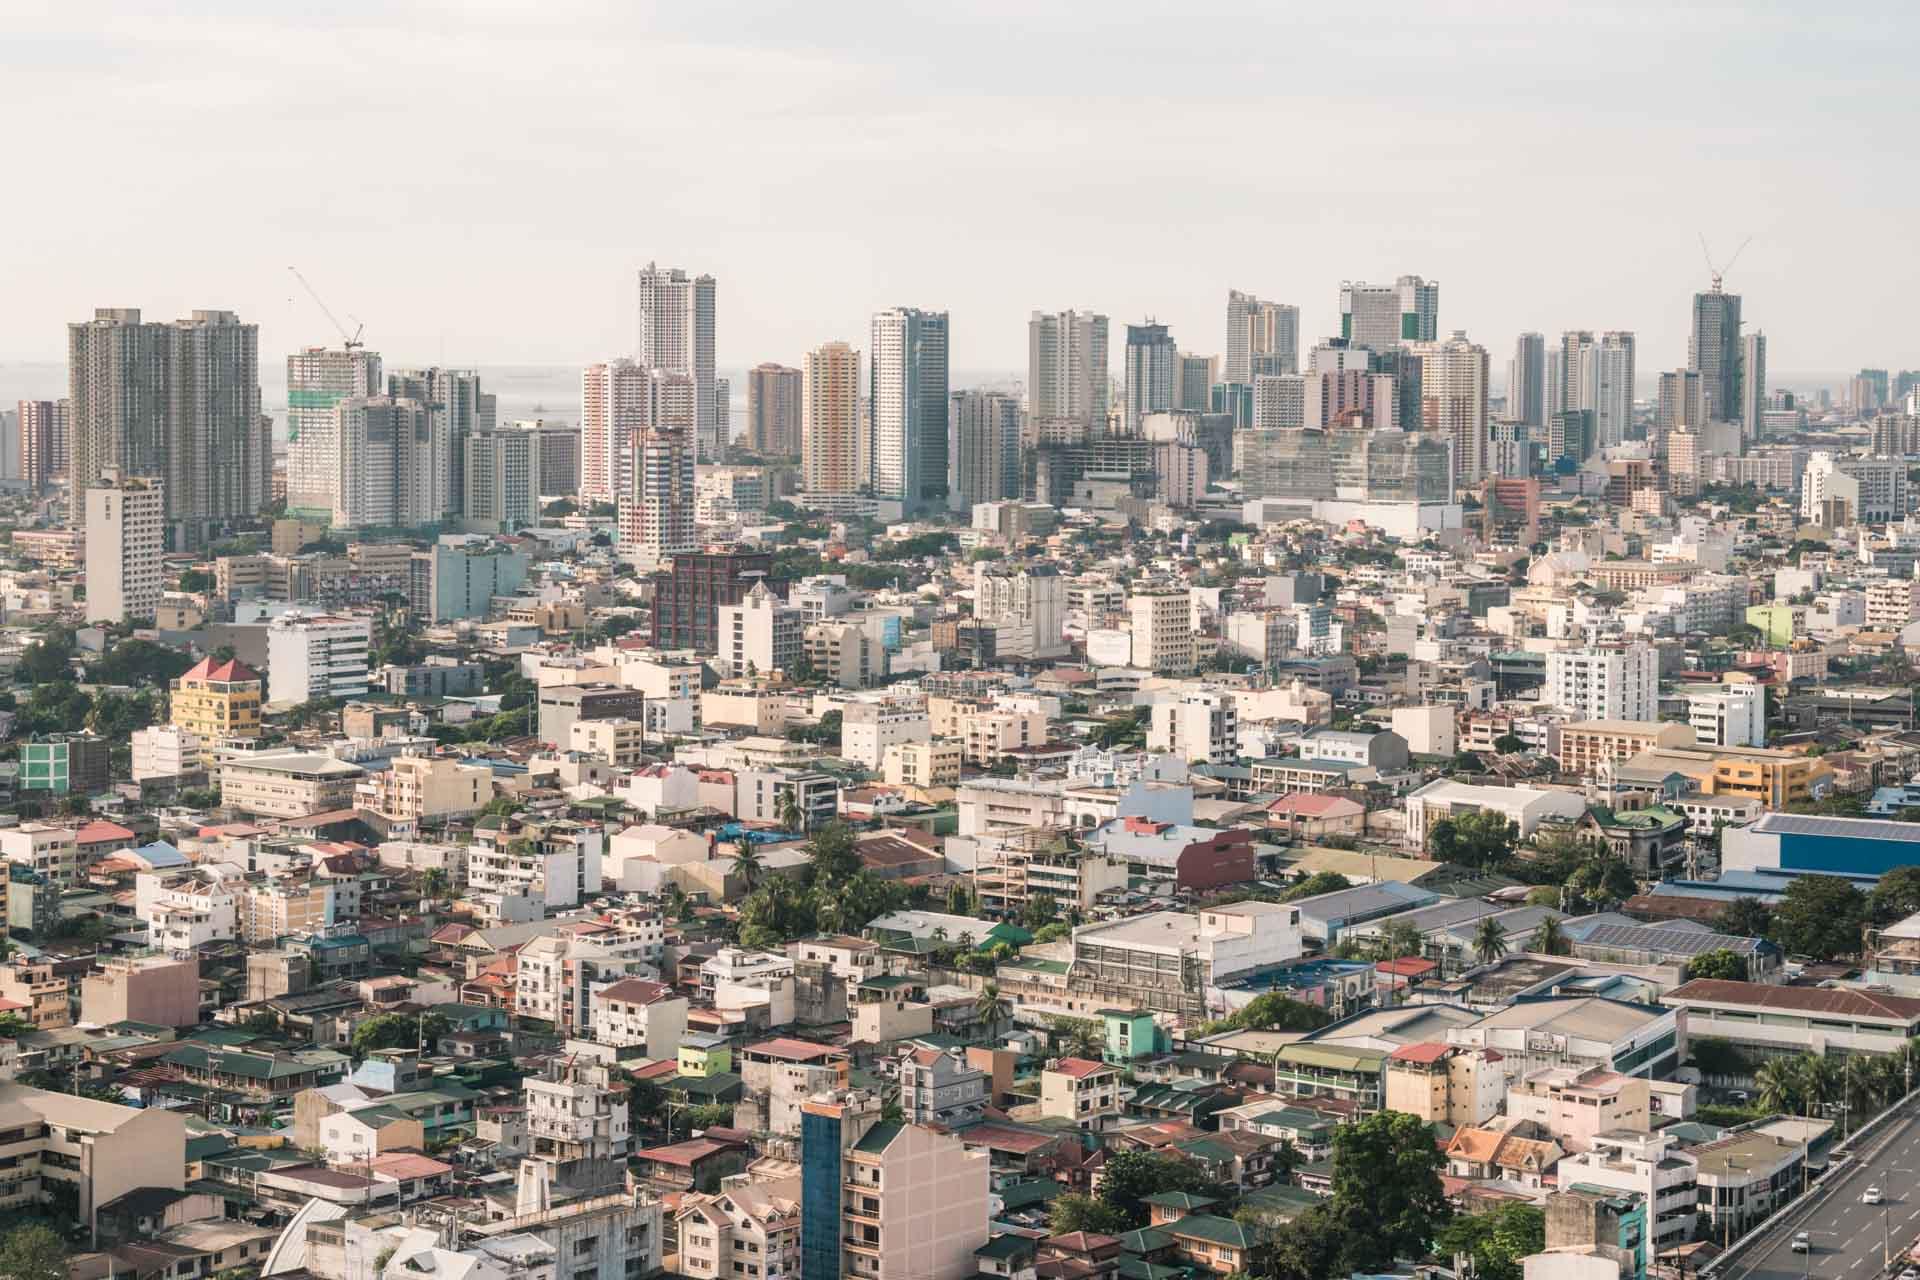 Makati, Manila for digital nomads